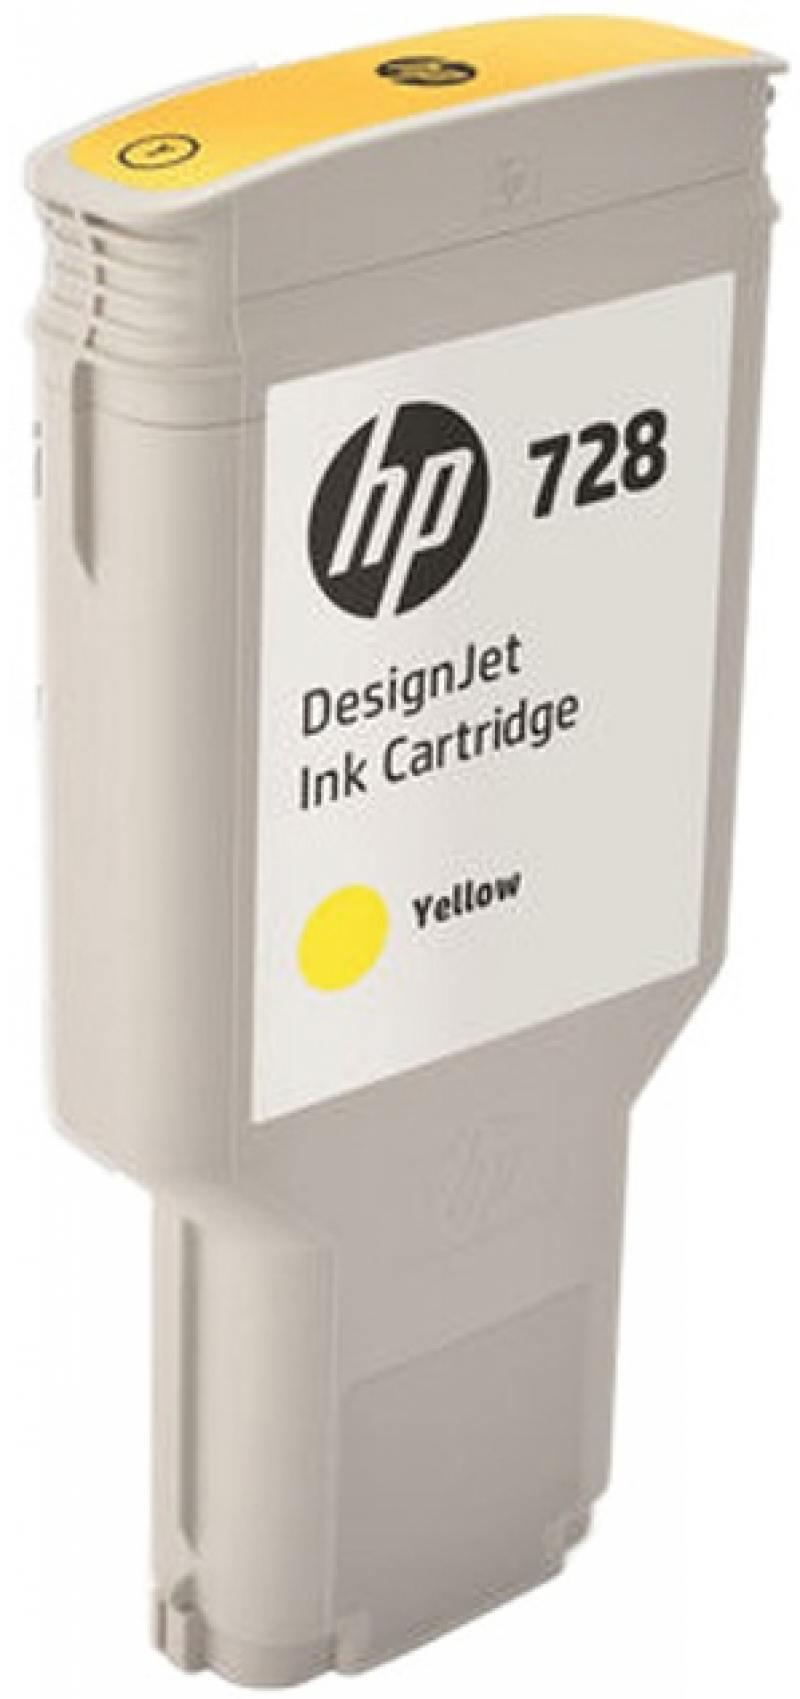 Картридж HP F9K15A (HP 728) для DesignJet T730, T830. Жёлтый. 300 мл. картридж hp 728 f9j61a yellow 40 мл